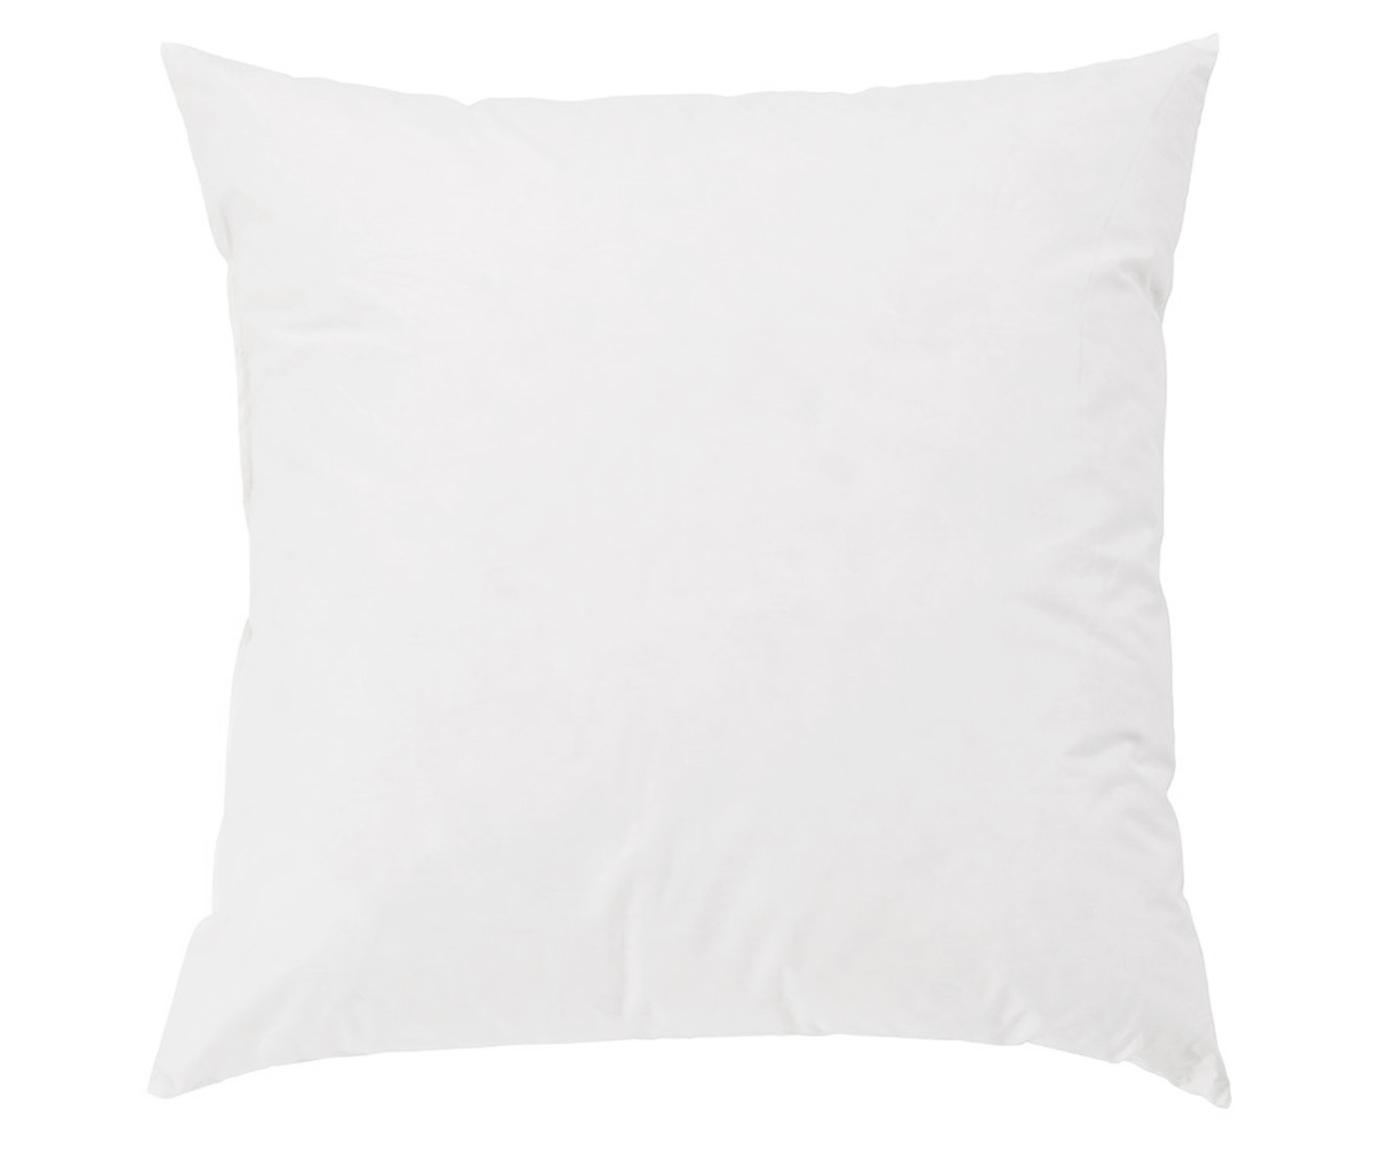 Relleno de cojín Premium, 50x50, Funda: percal Mako, 100%algodón, Blanco, An 50 x L 50 cm